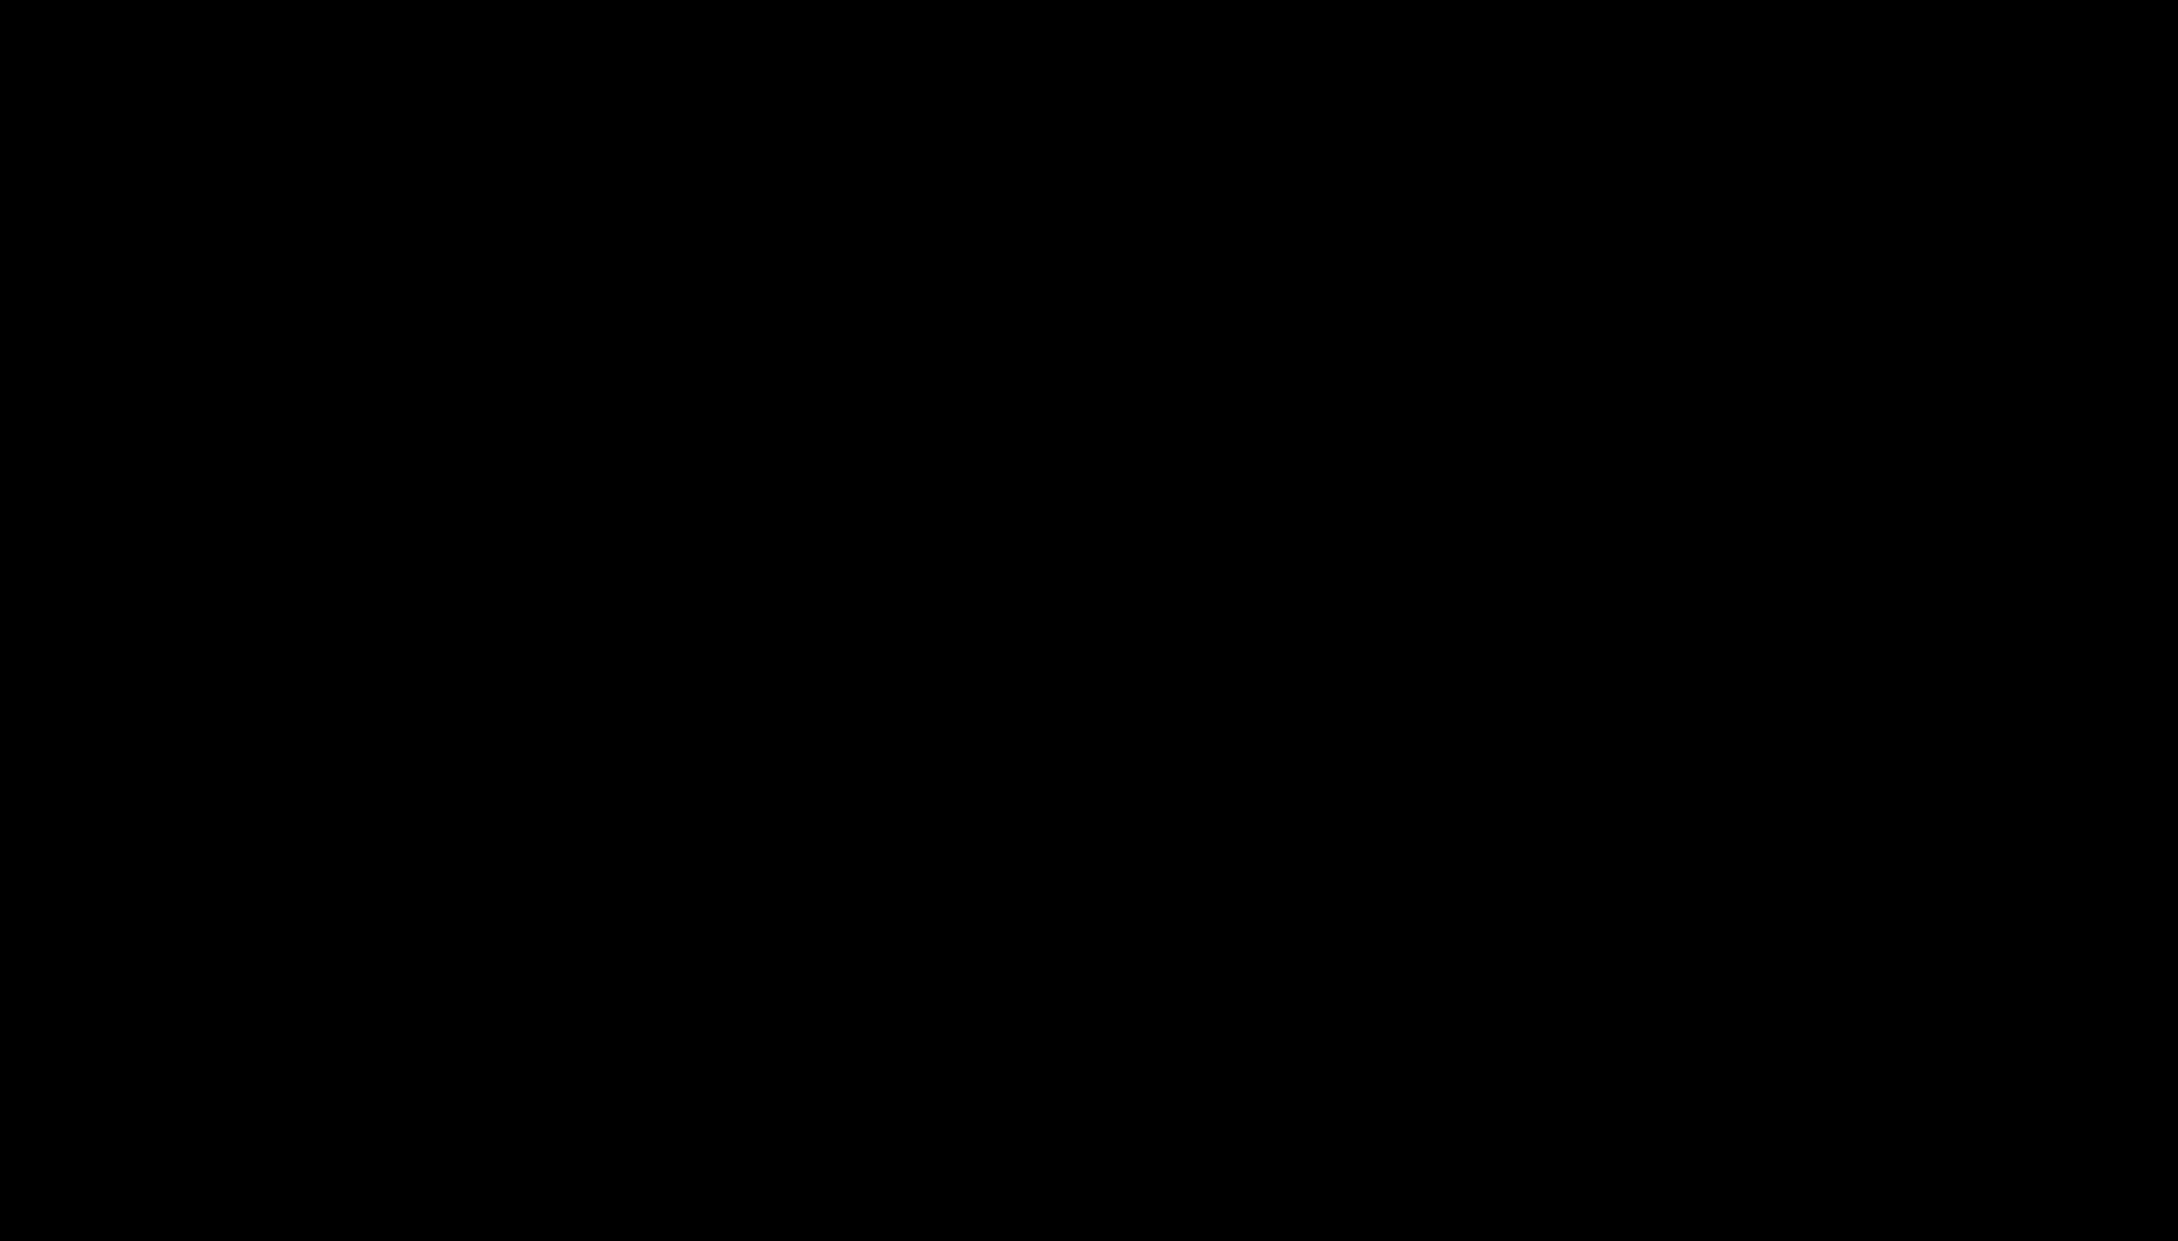 2178x1241 Snail Silhouette Clipart